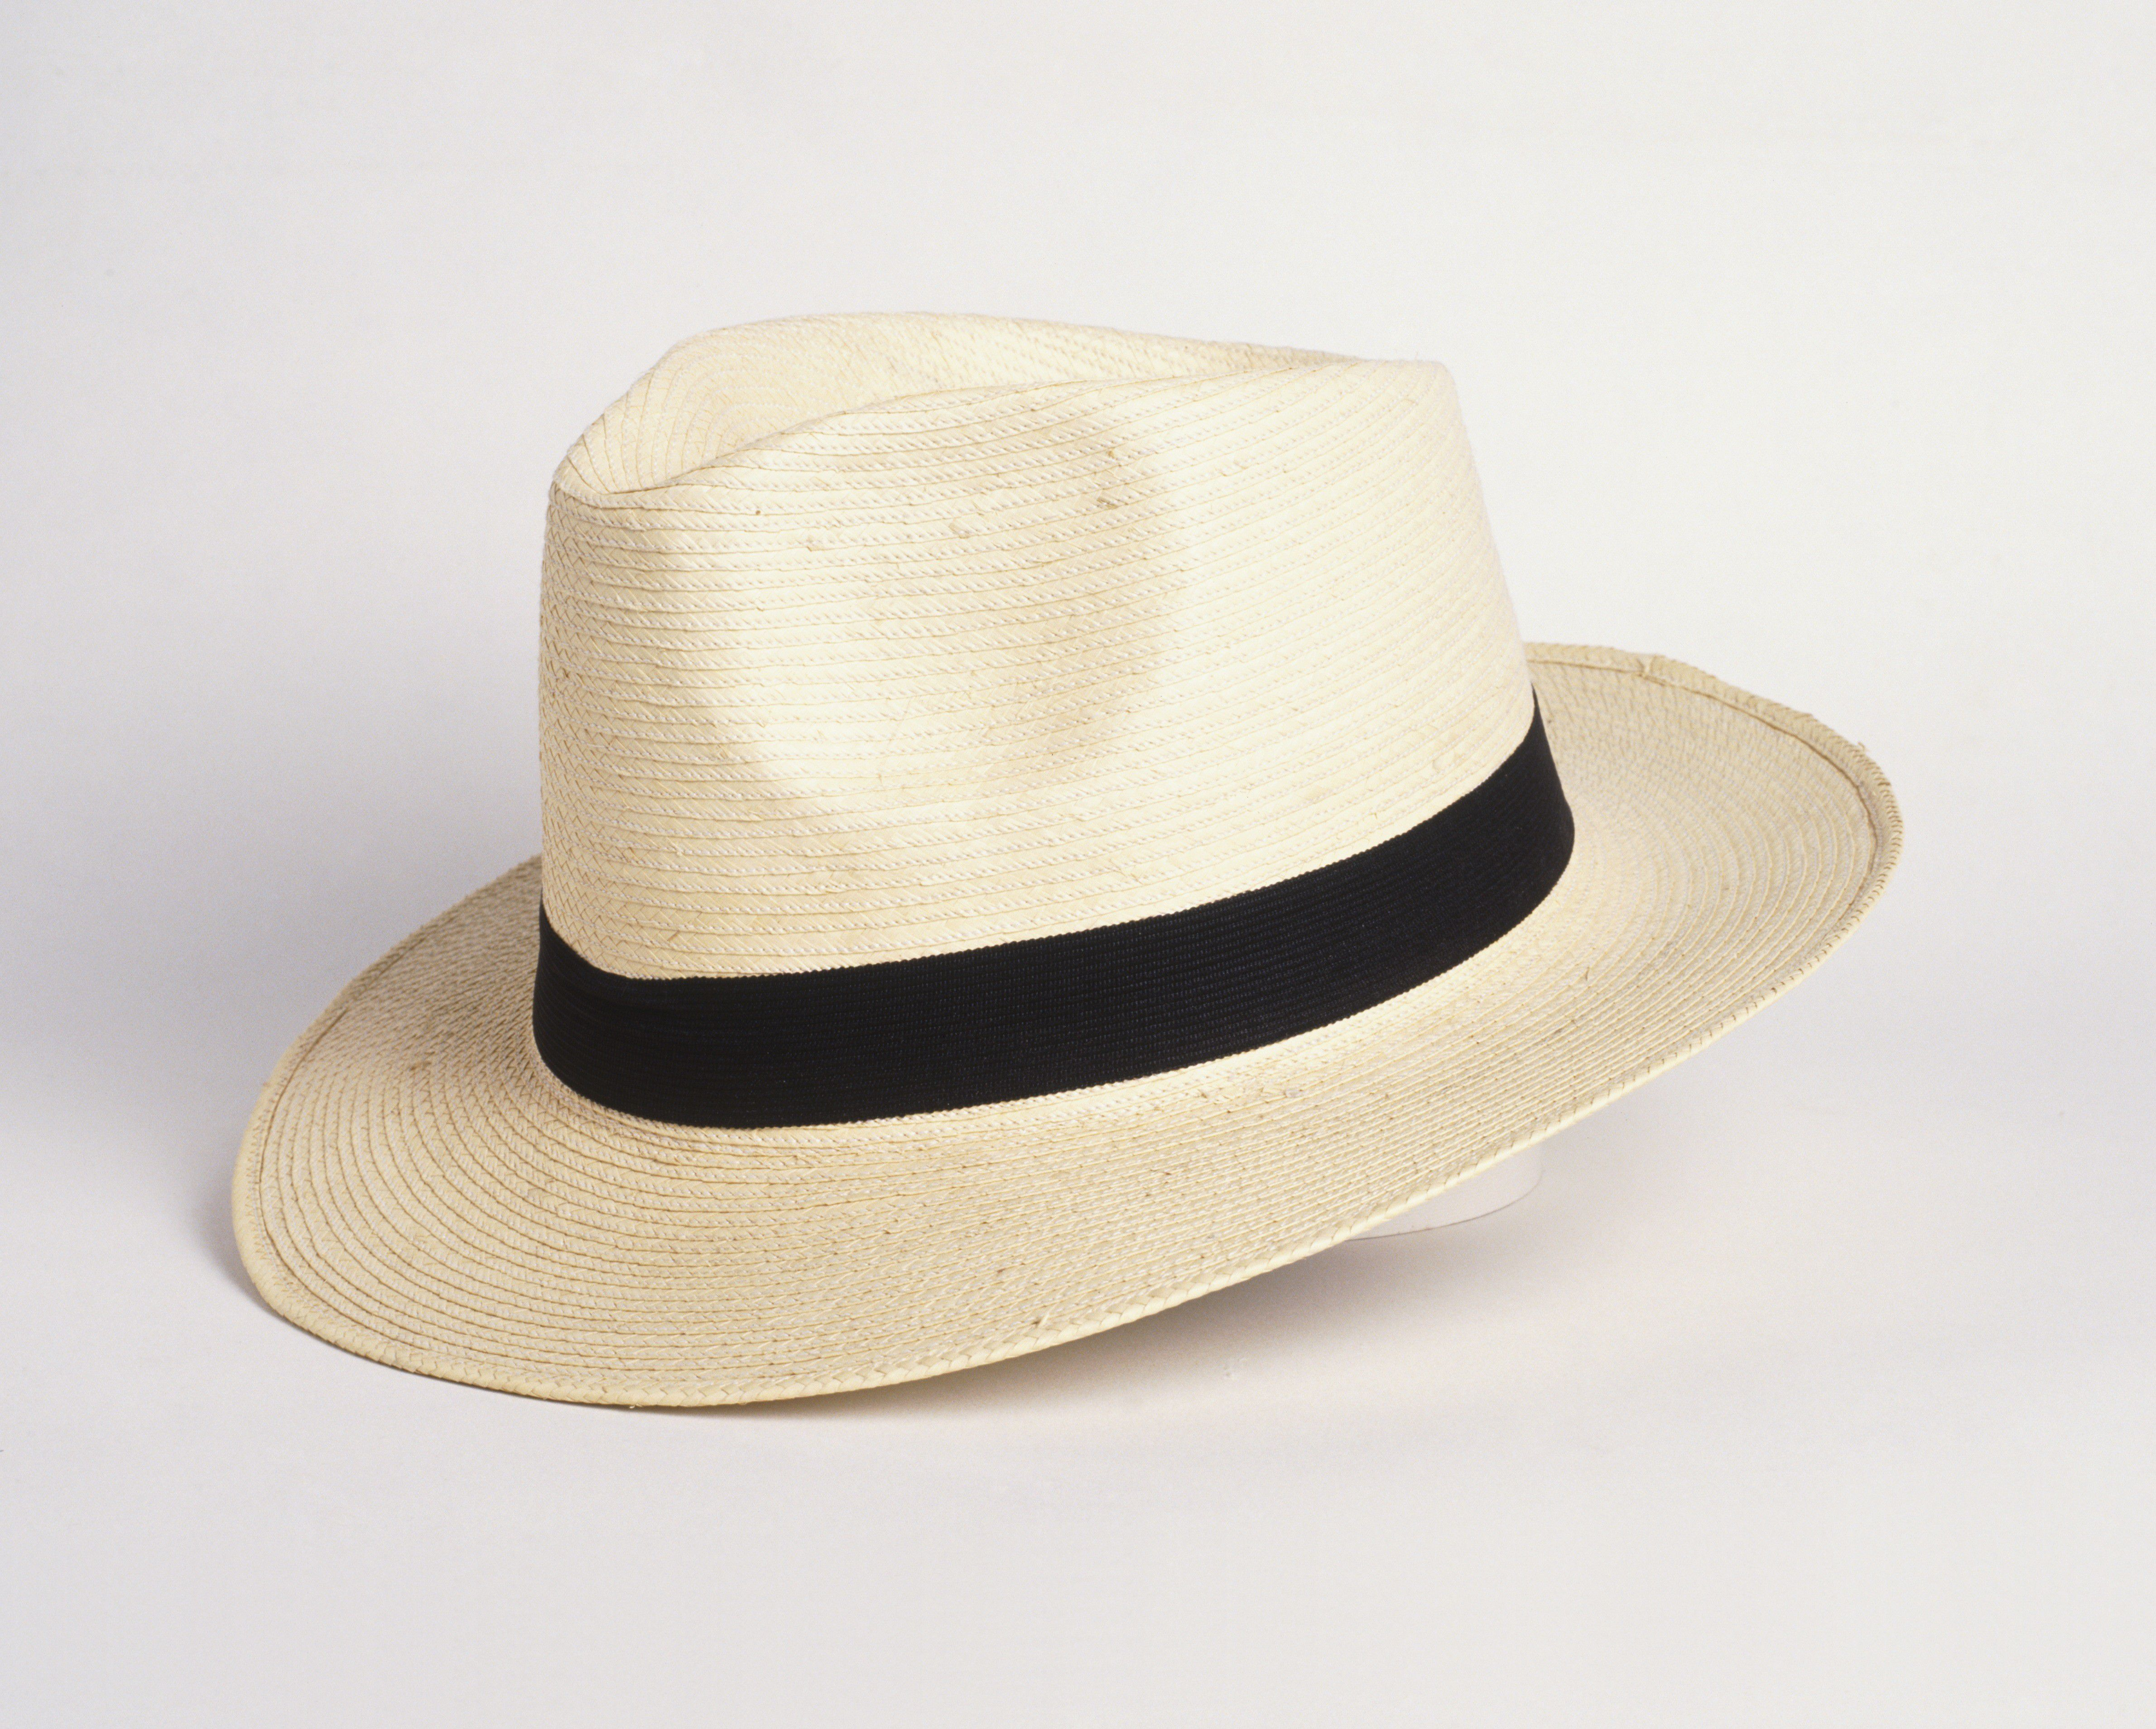 Panama hat, close up.